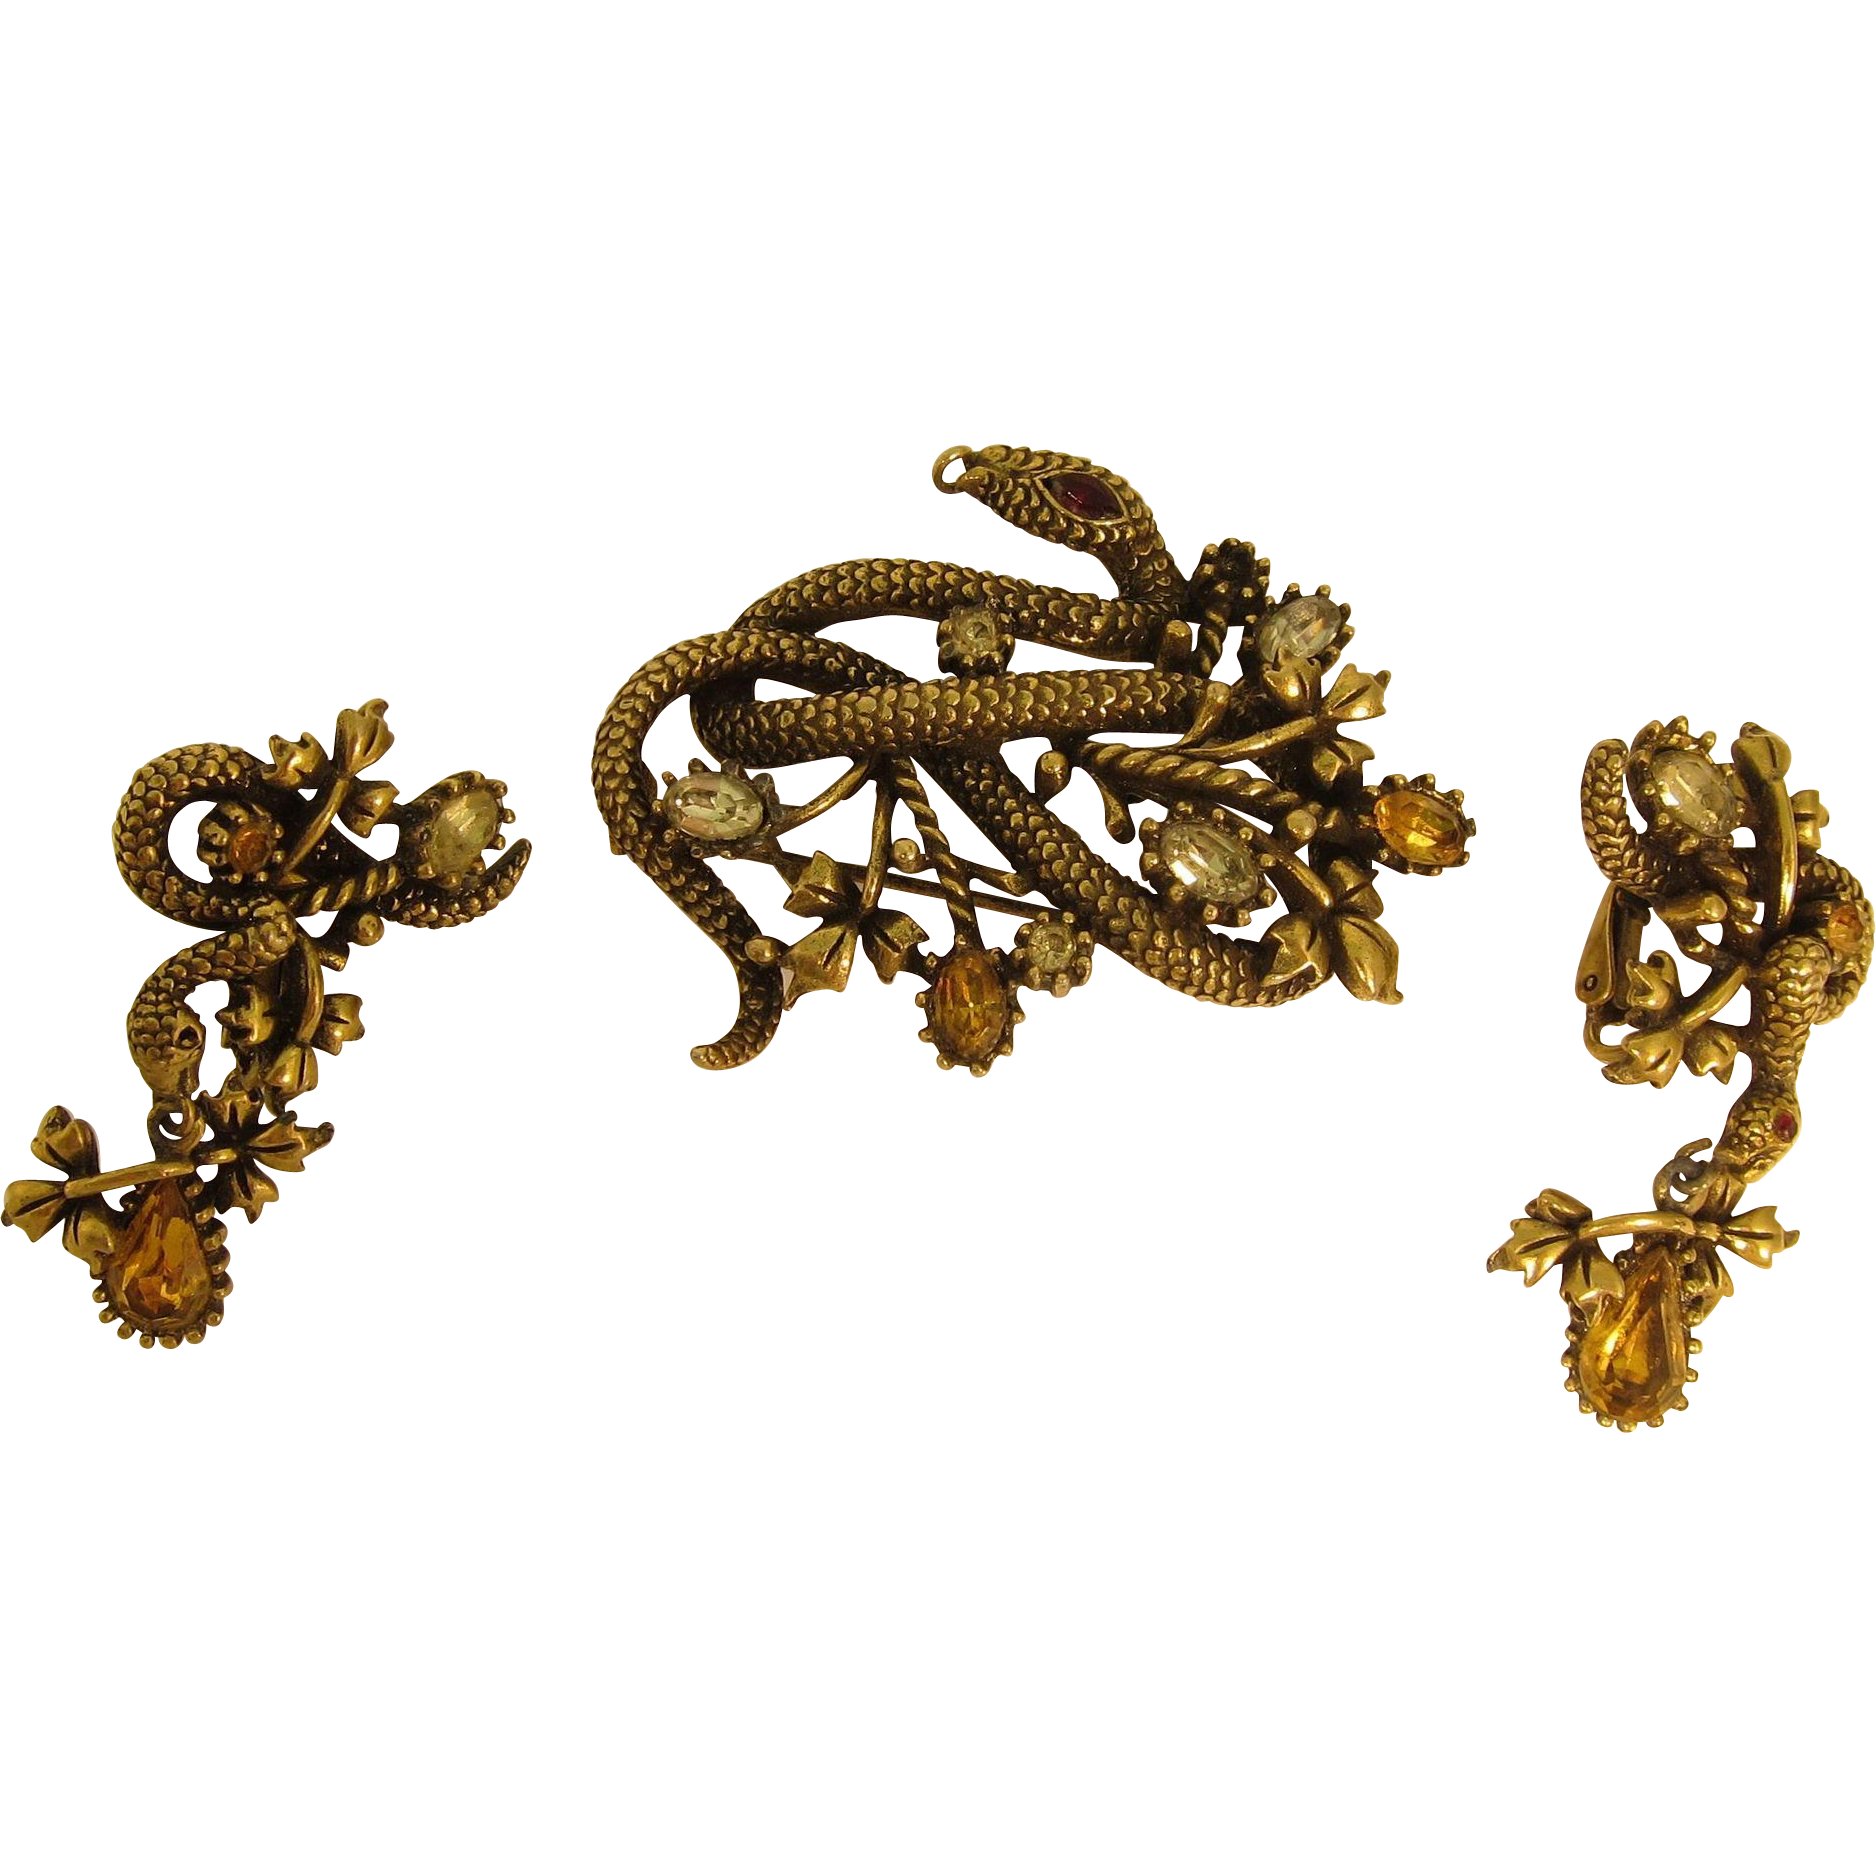 Vintage Coro Snake Brooch / Pin and Earrings Set